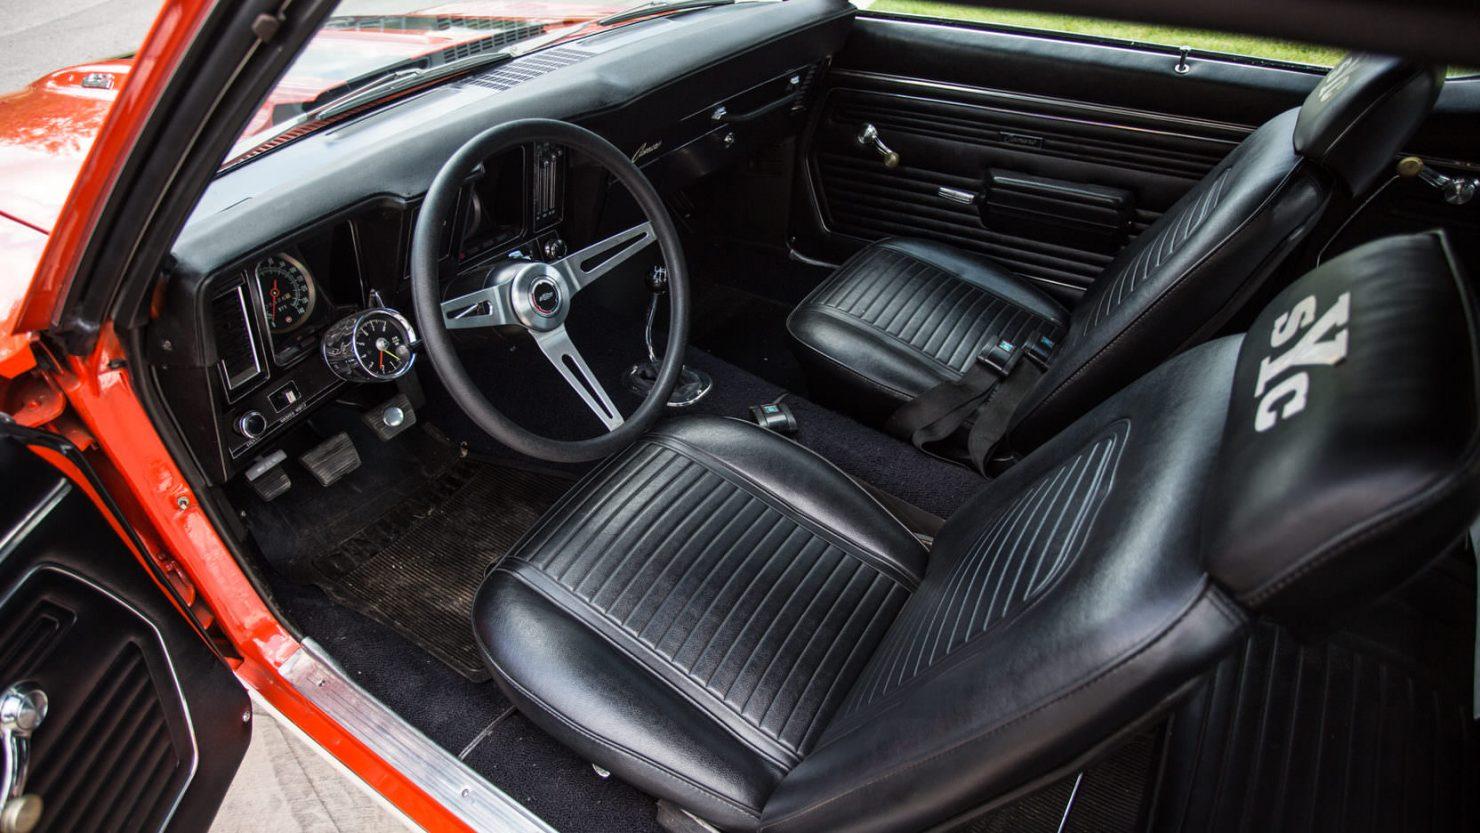 Chevrolet Yenko Camaro 10 1480x833 - 1969 Chevrolet Yenko Camaro